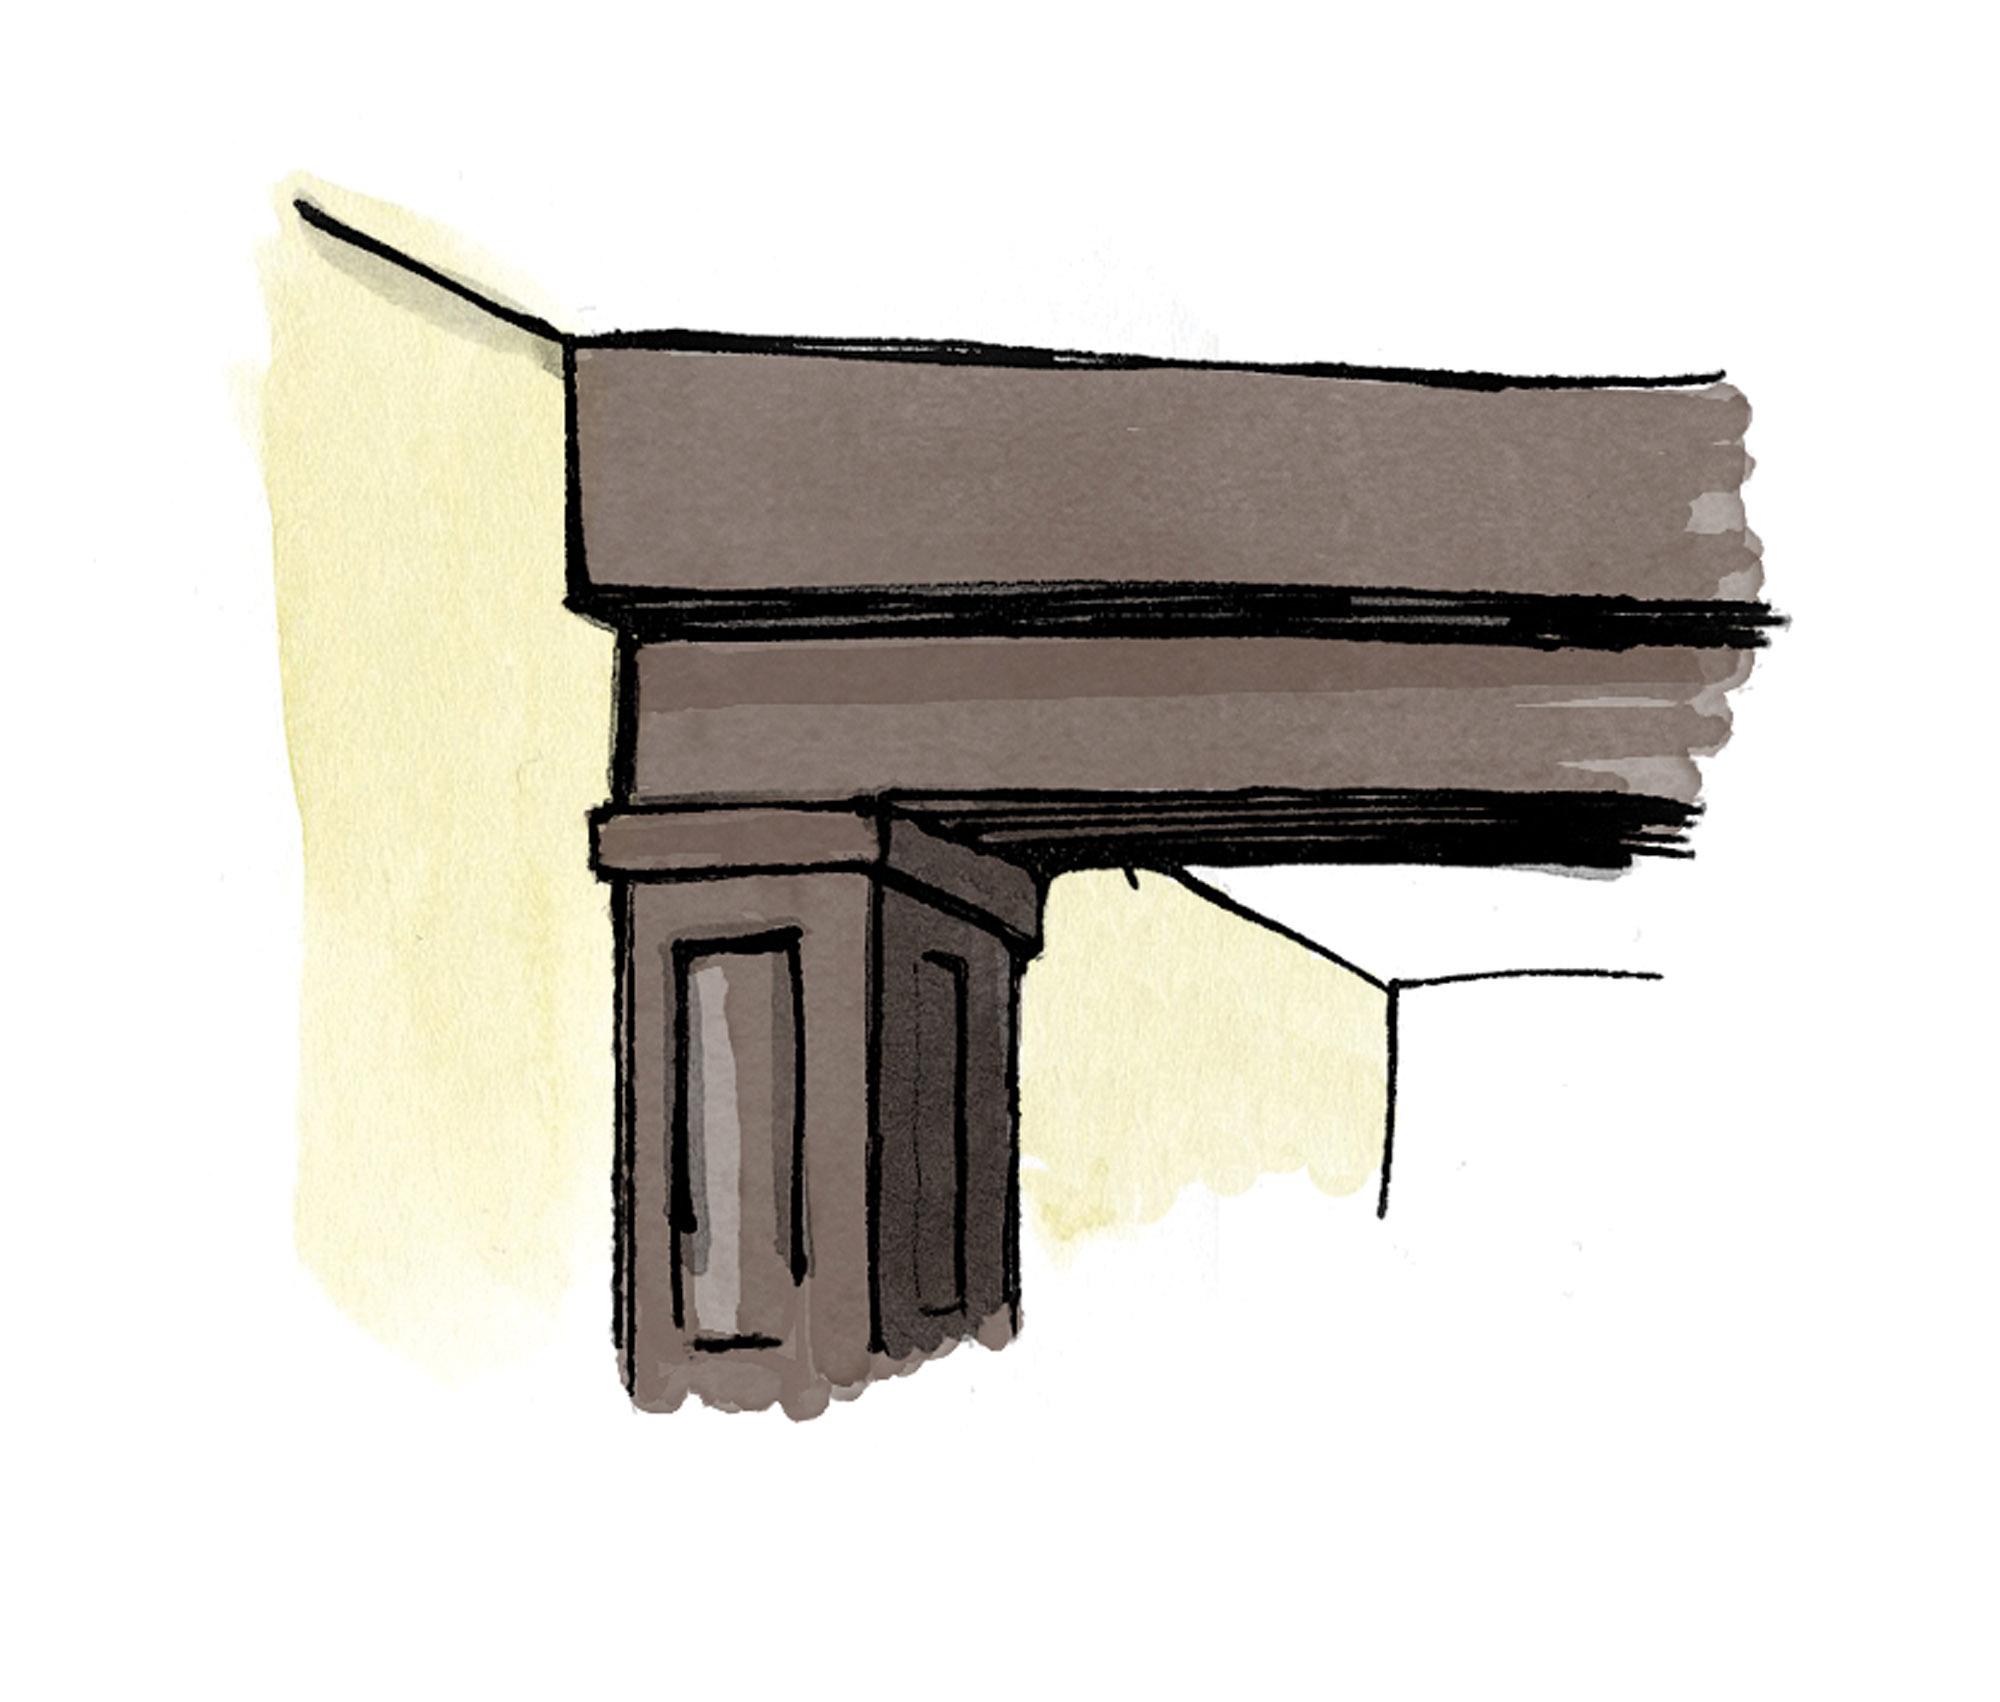 sagging beam illustration